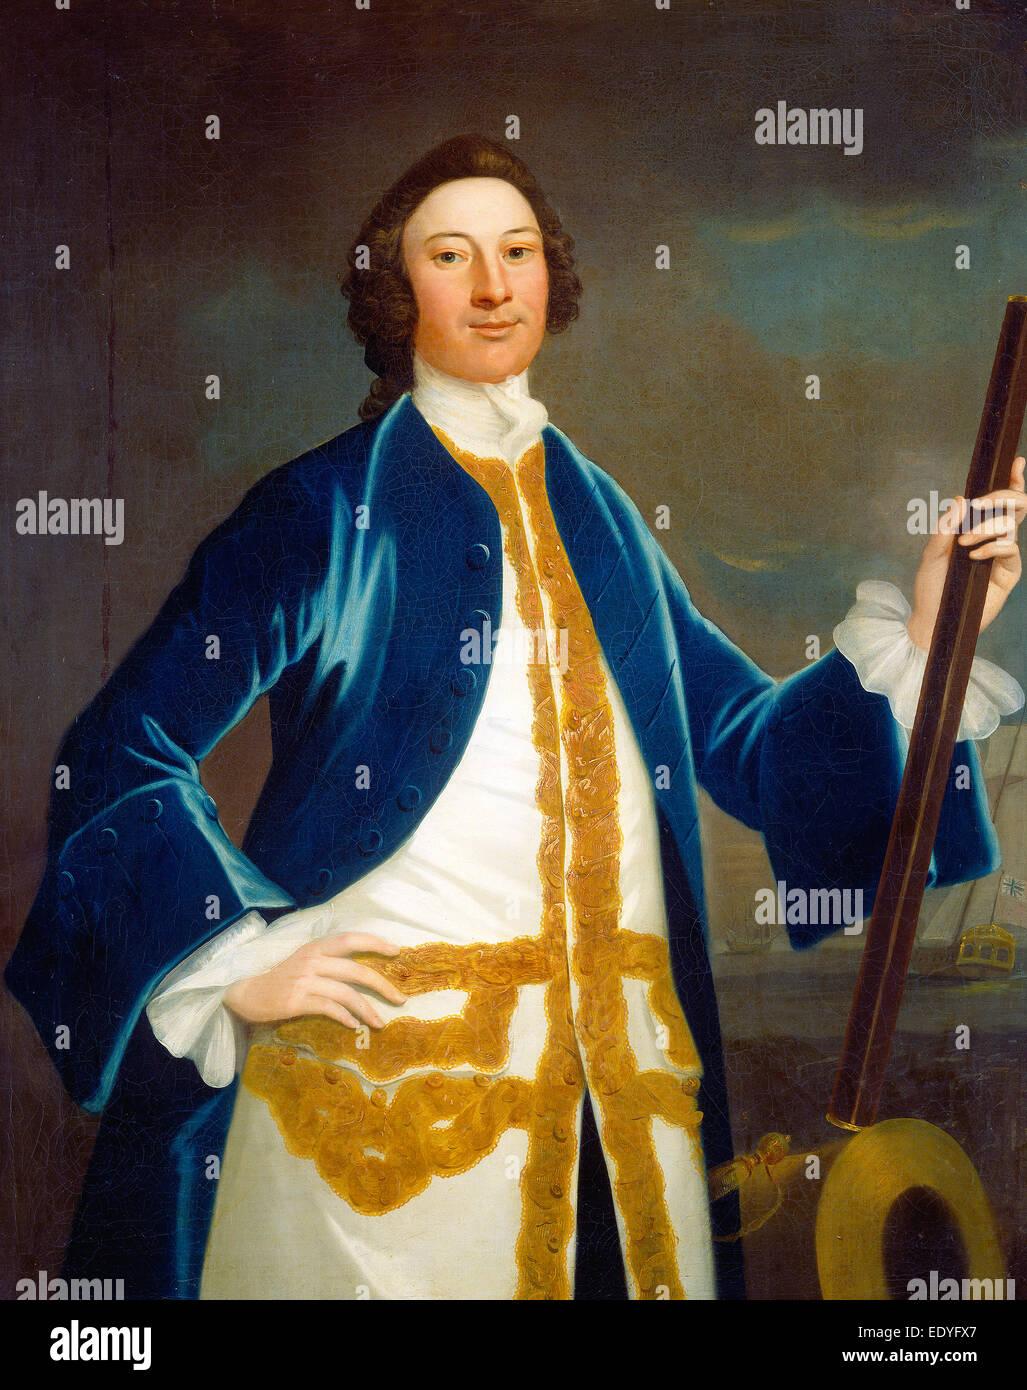 John Wollaston (American, active 1742-1775), Unidentified British Navy Officer, c. 1745, oil on canvas - Stock Image